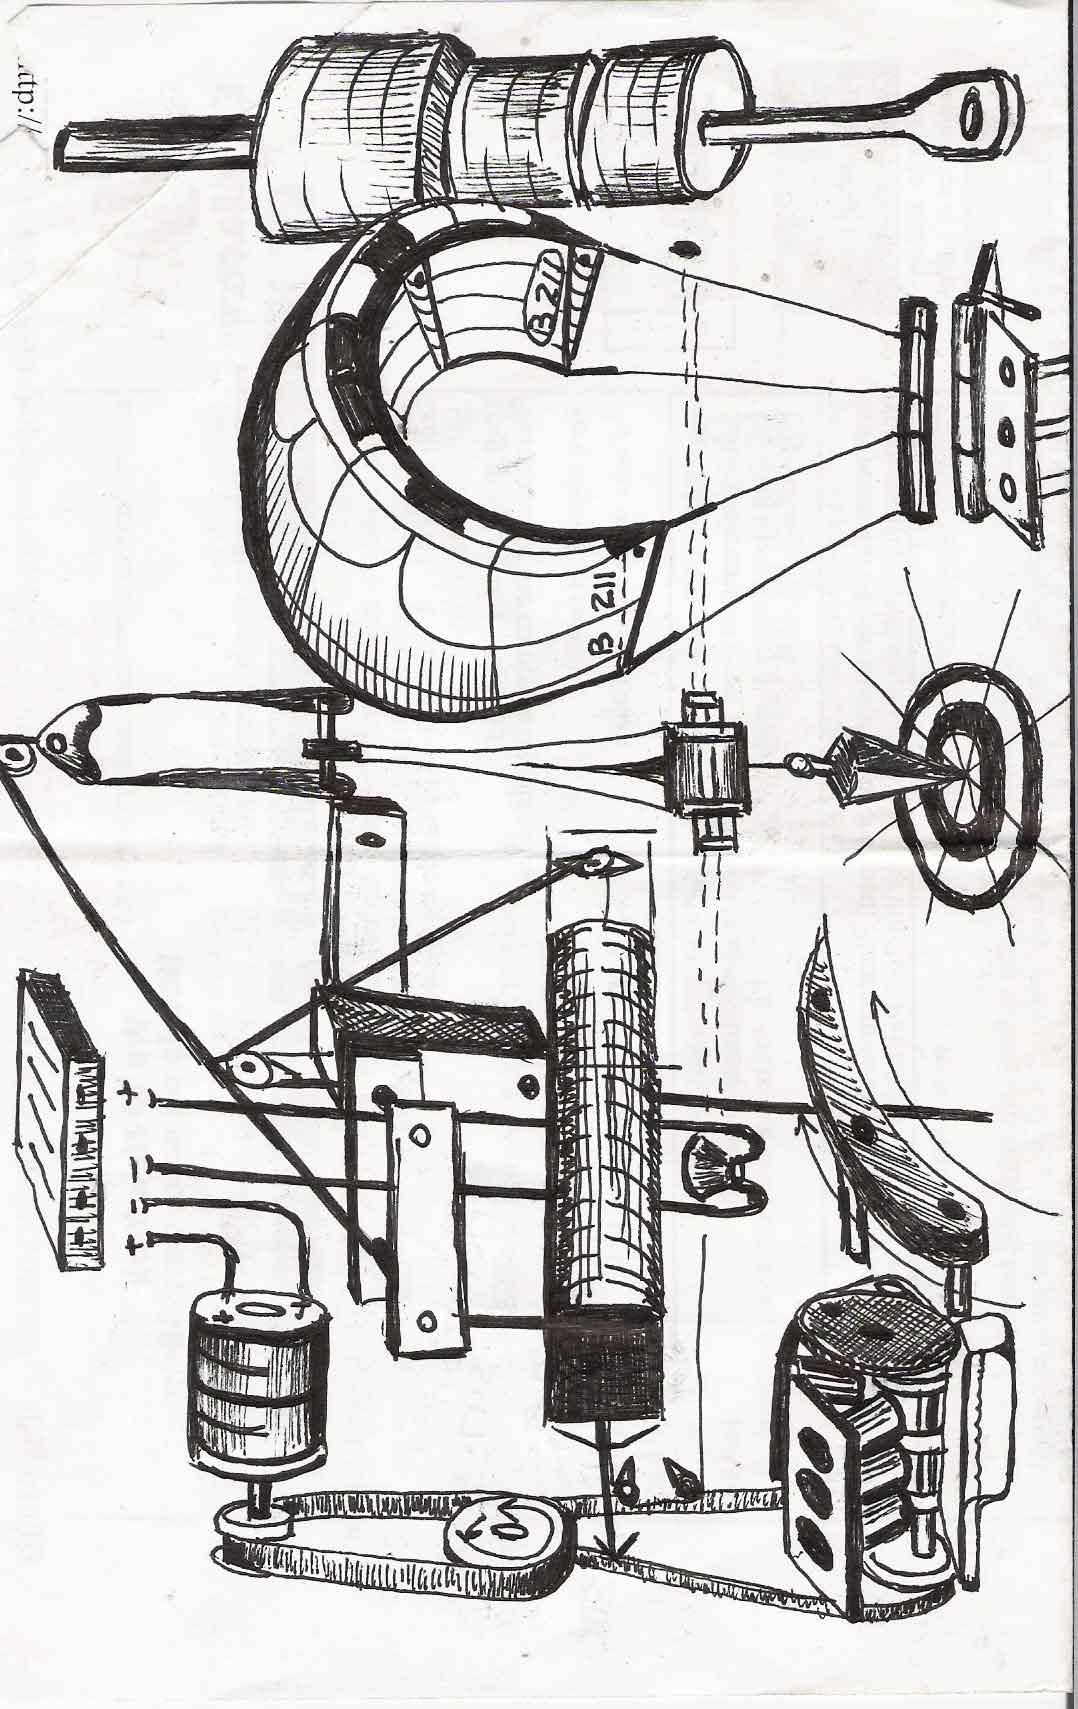 sketch-39-sept-05.jpg